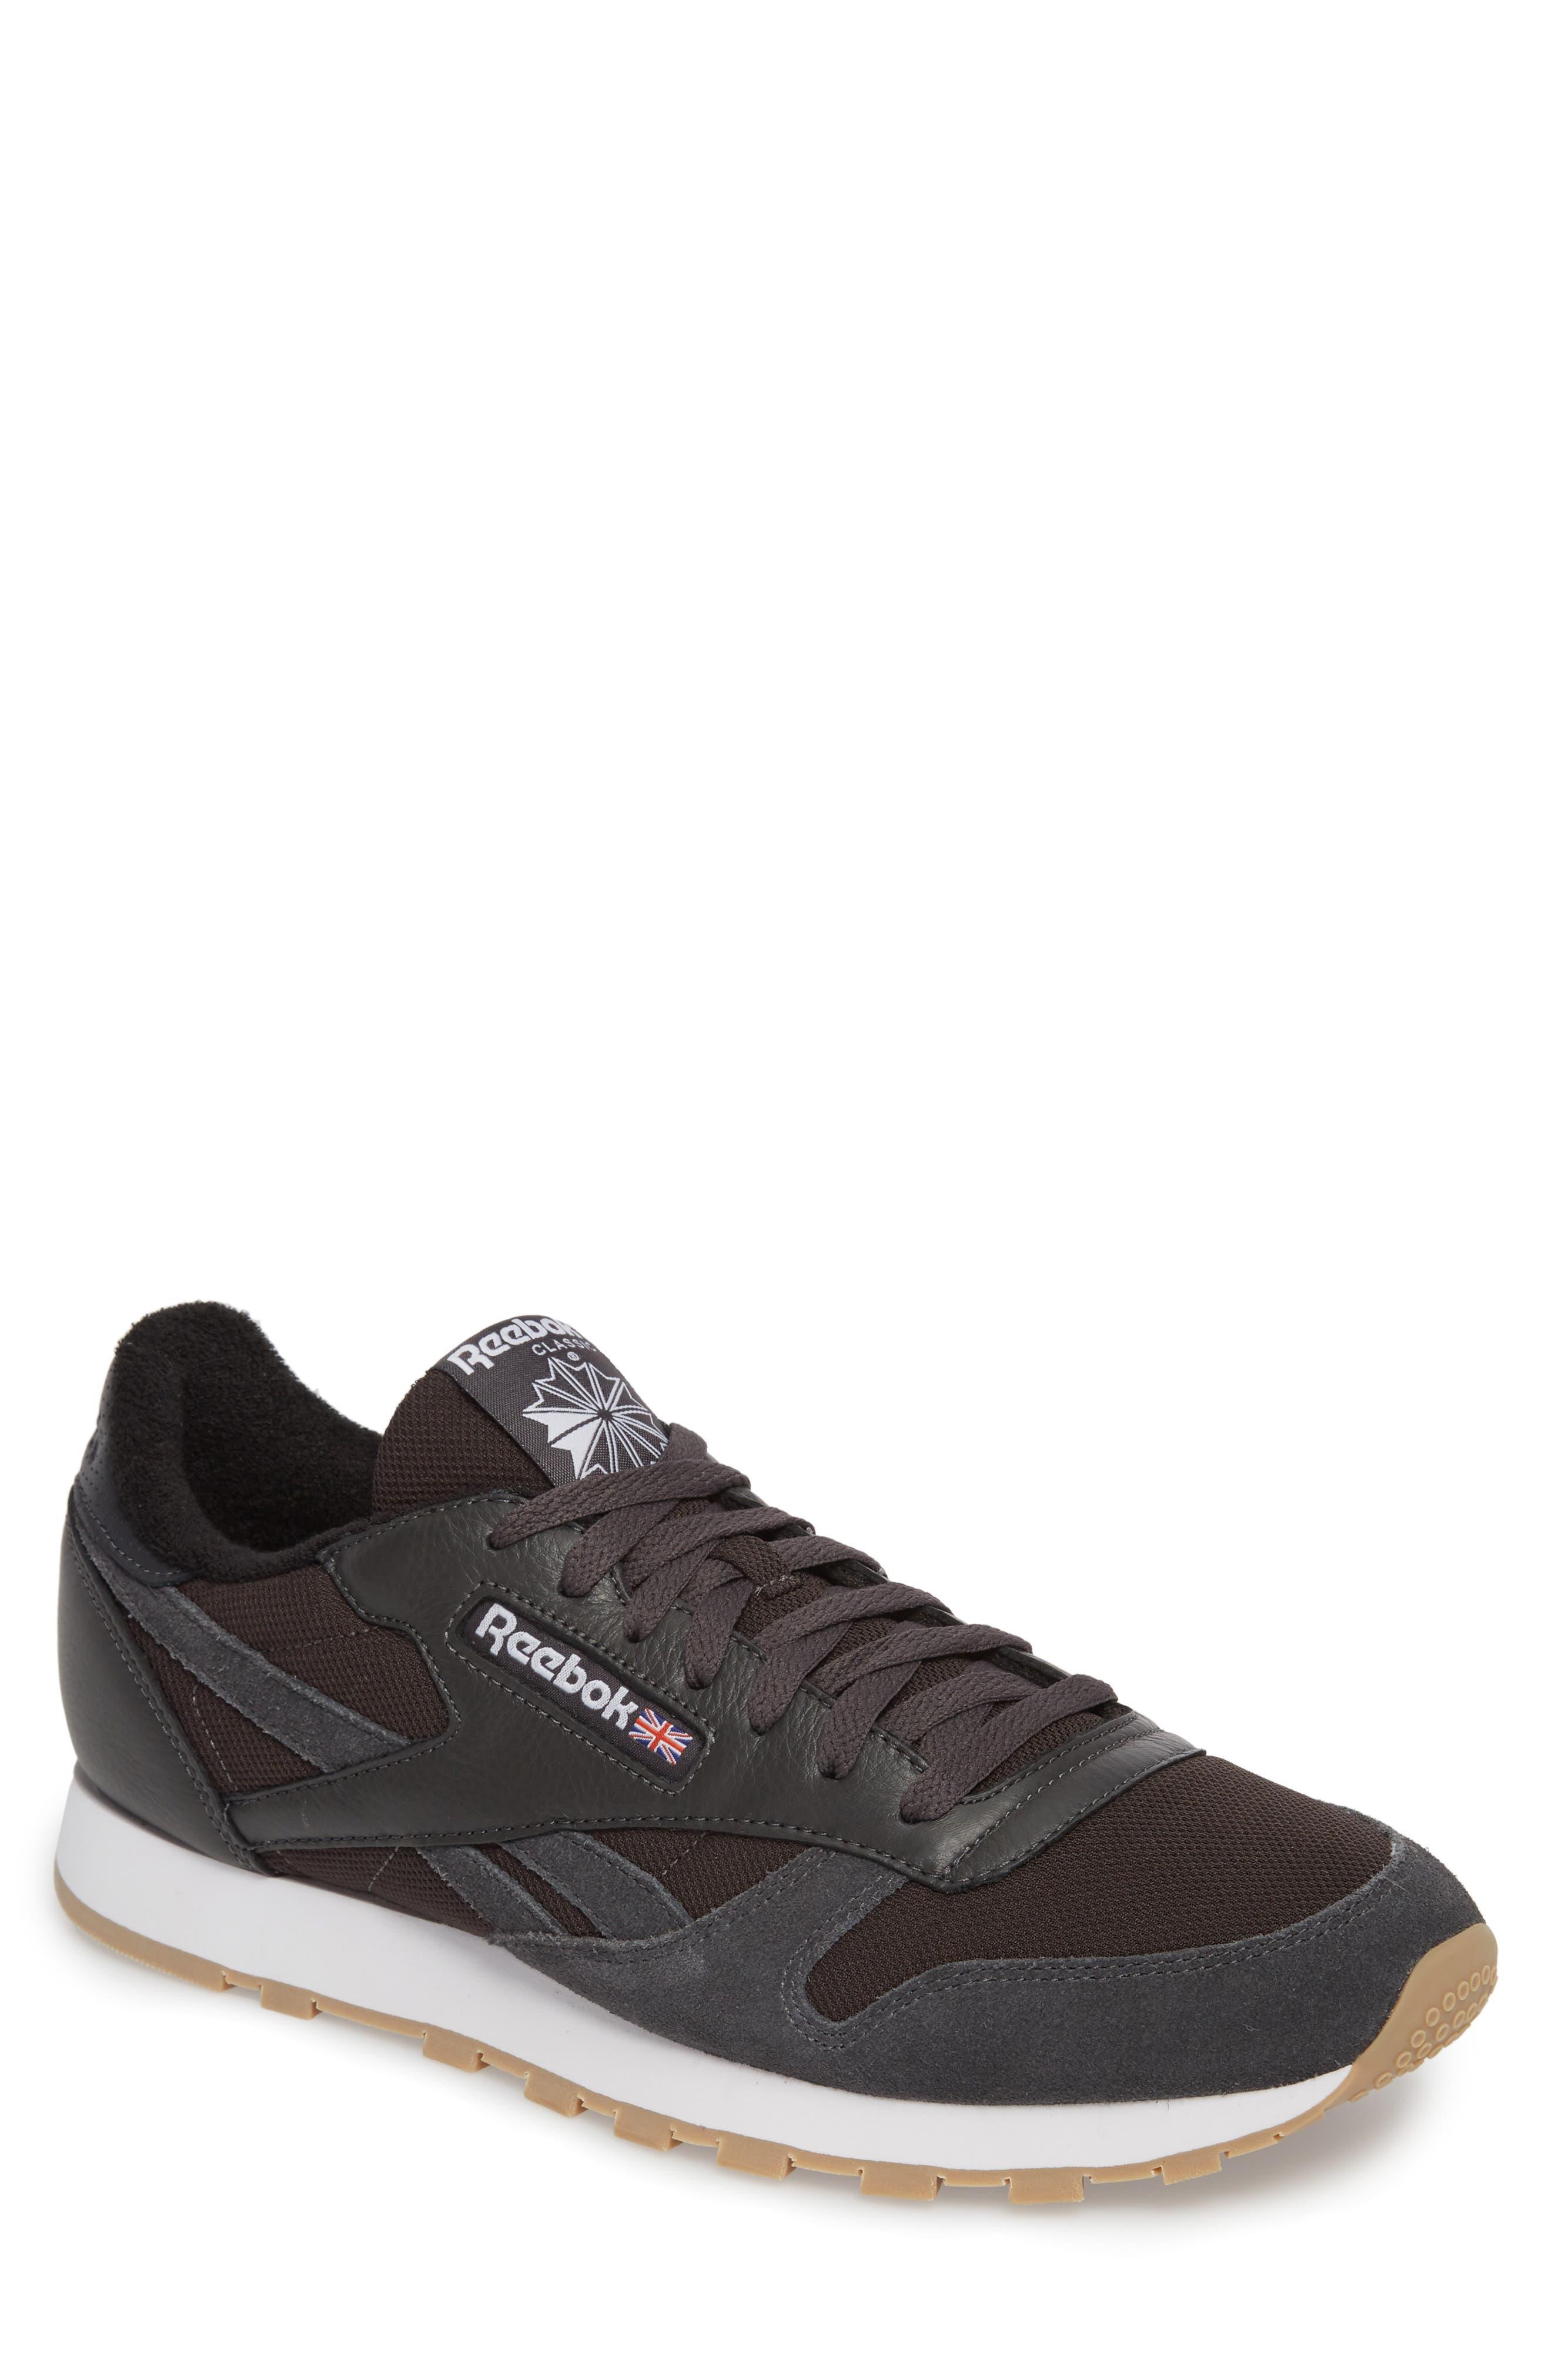 ESTL Classic Leather Sneaker,                         Main,                         color, 001